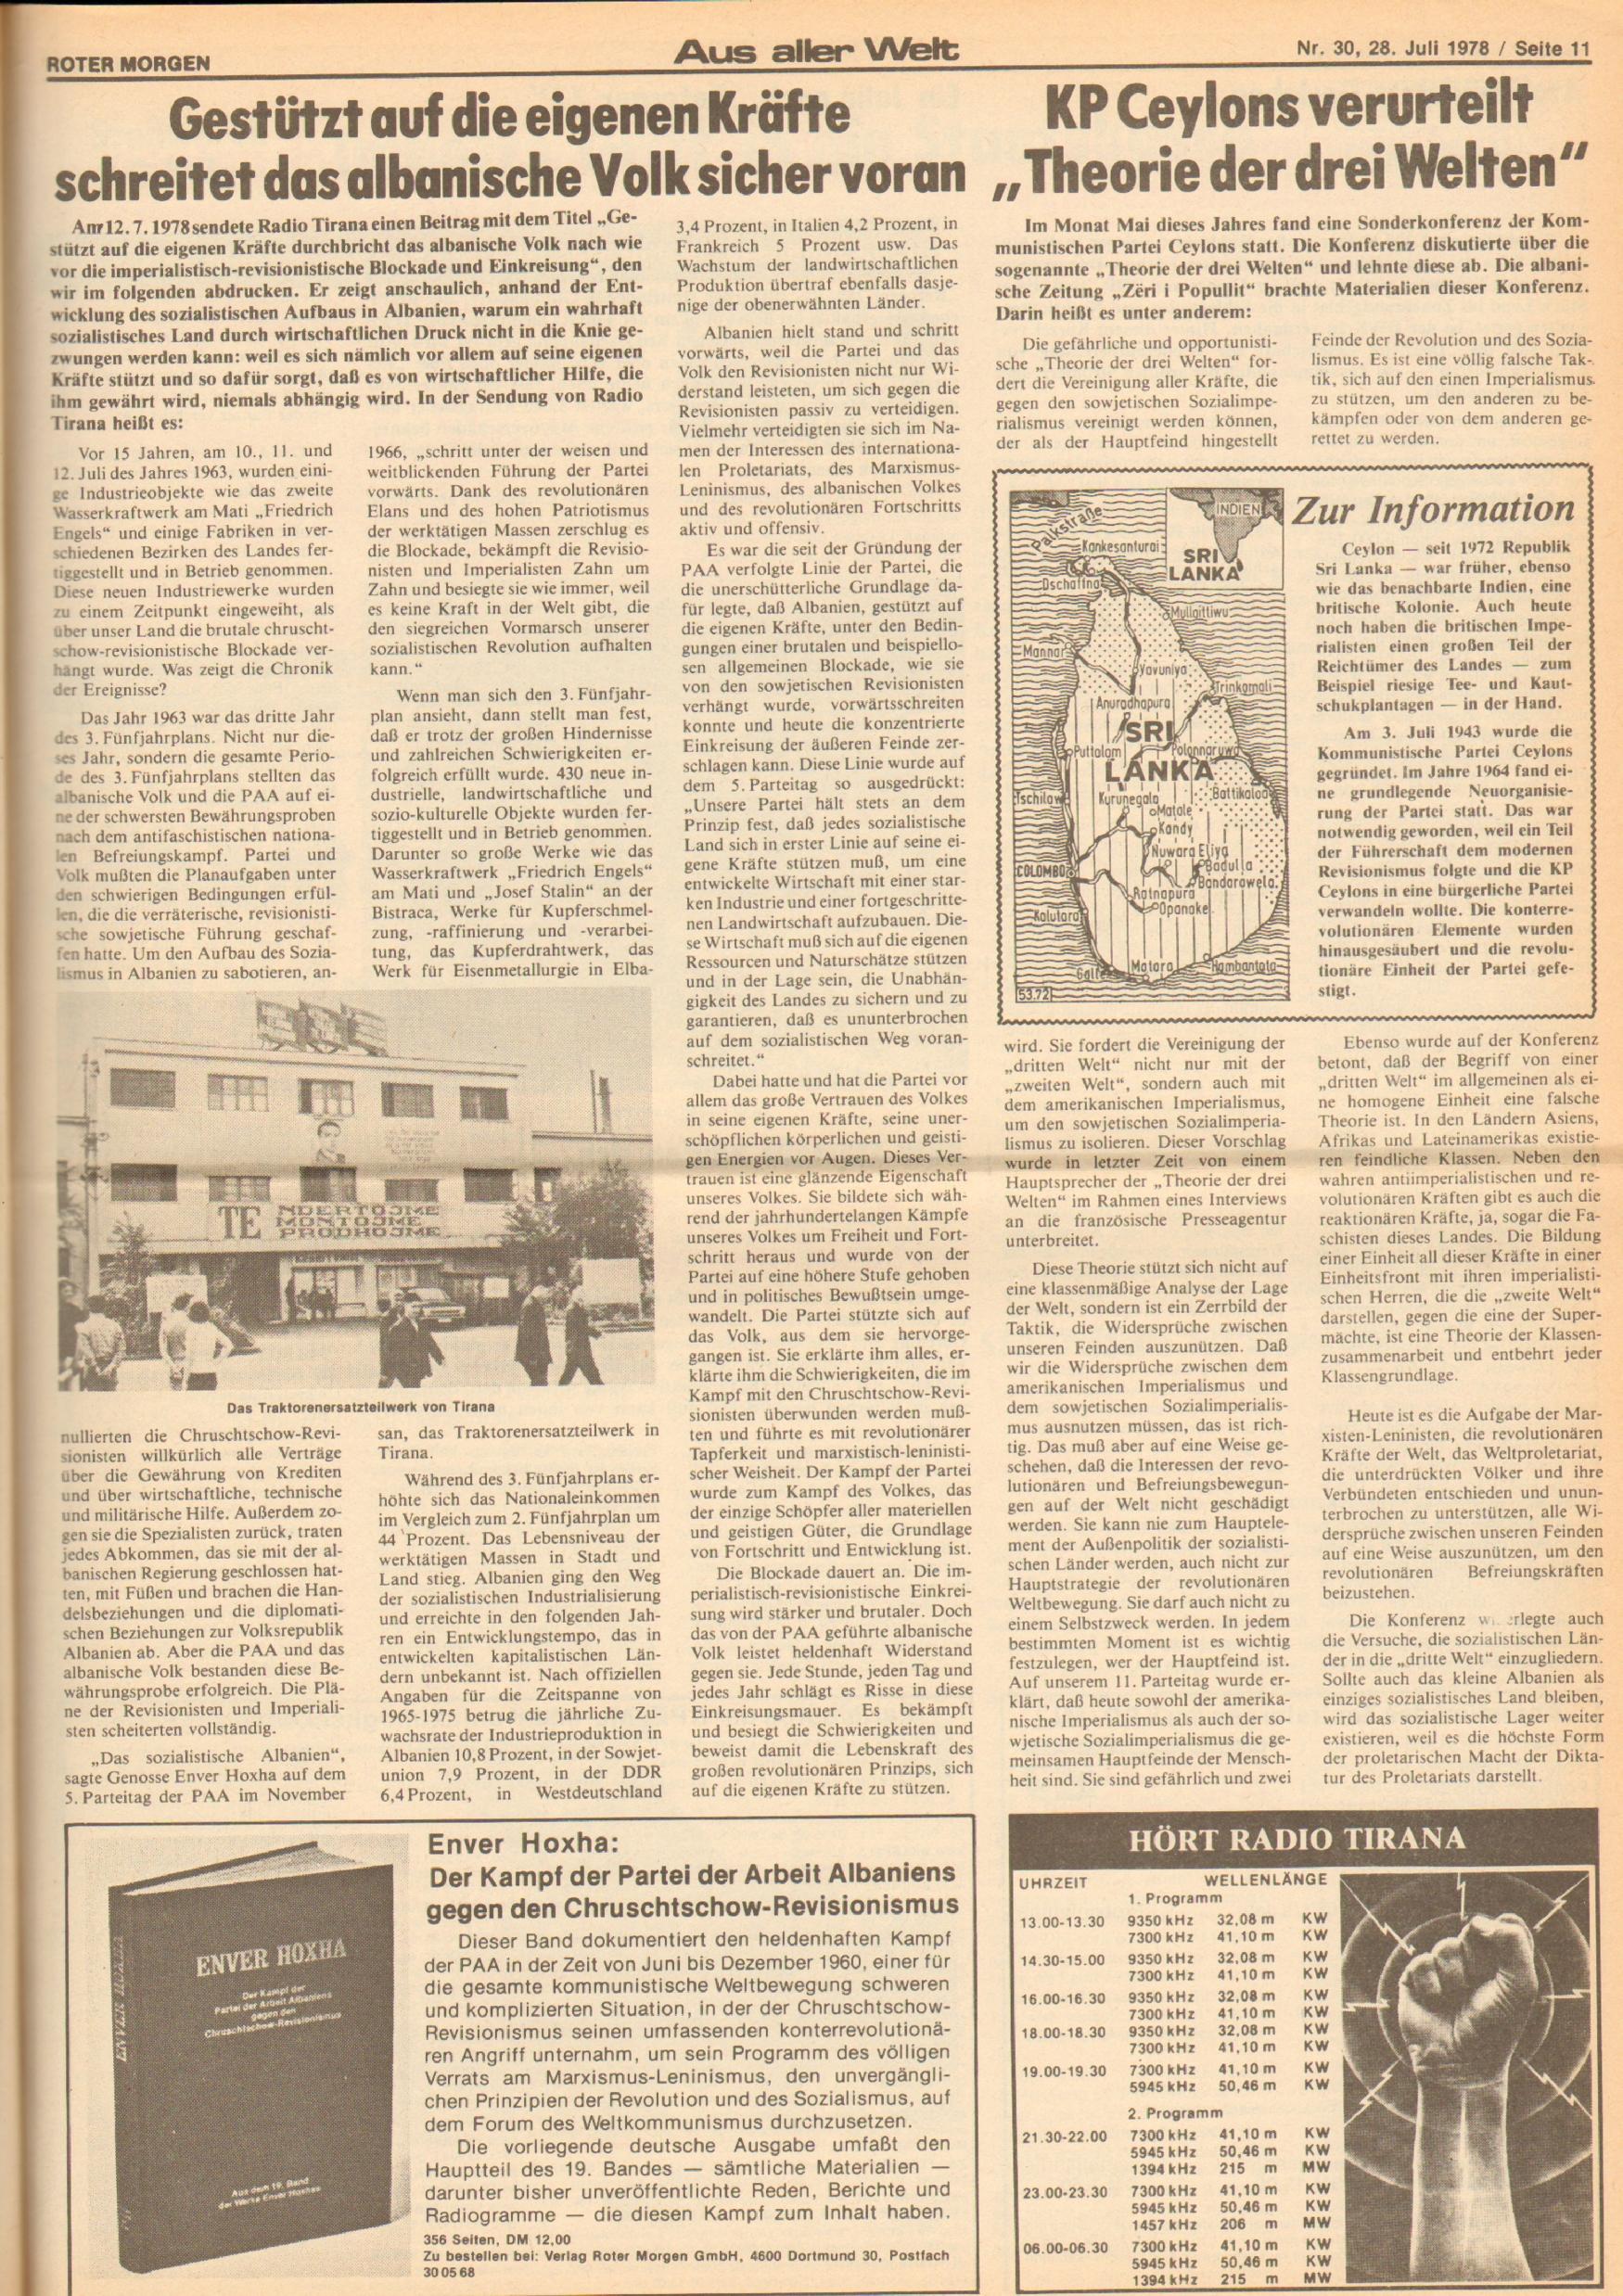 Roter Morgen, 12. Jg., 28. Juli 1978, Nr. 30, Seite 11